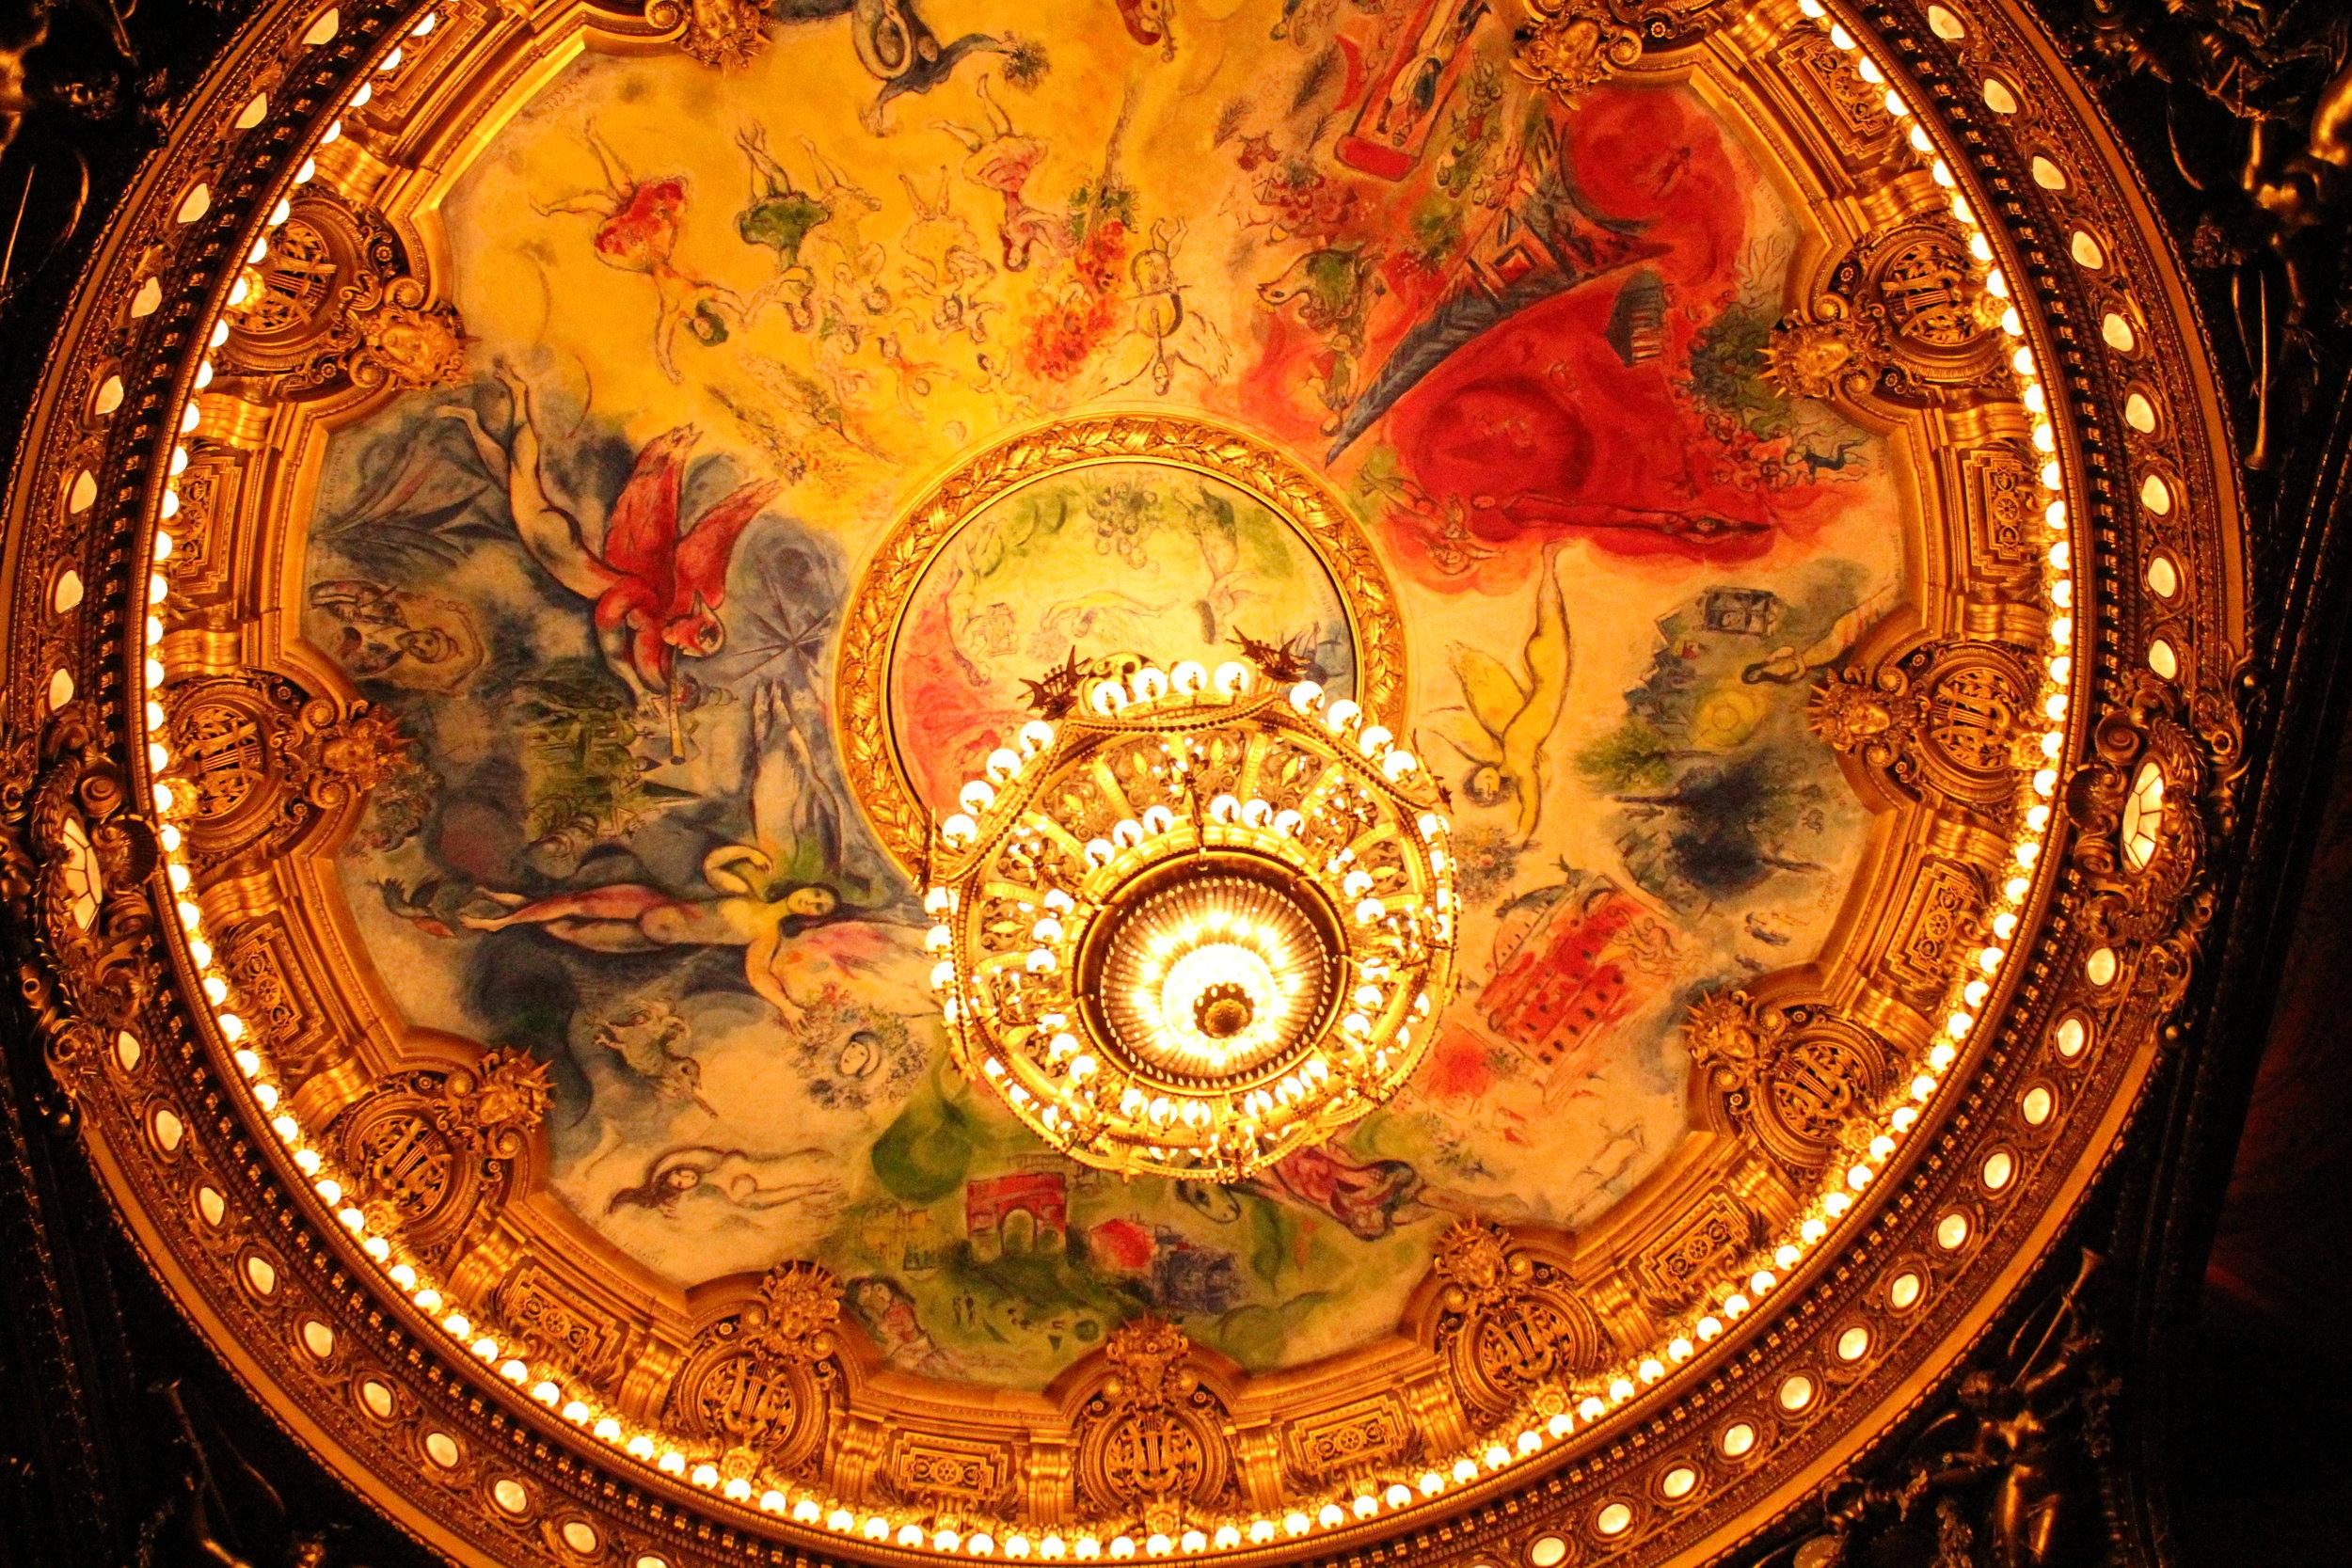 Marc Chagall's painted ceiling, chandelier, L'Opèra Paris. Chandelier weighs 8 tonnes.